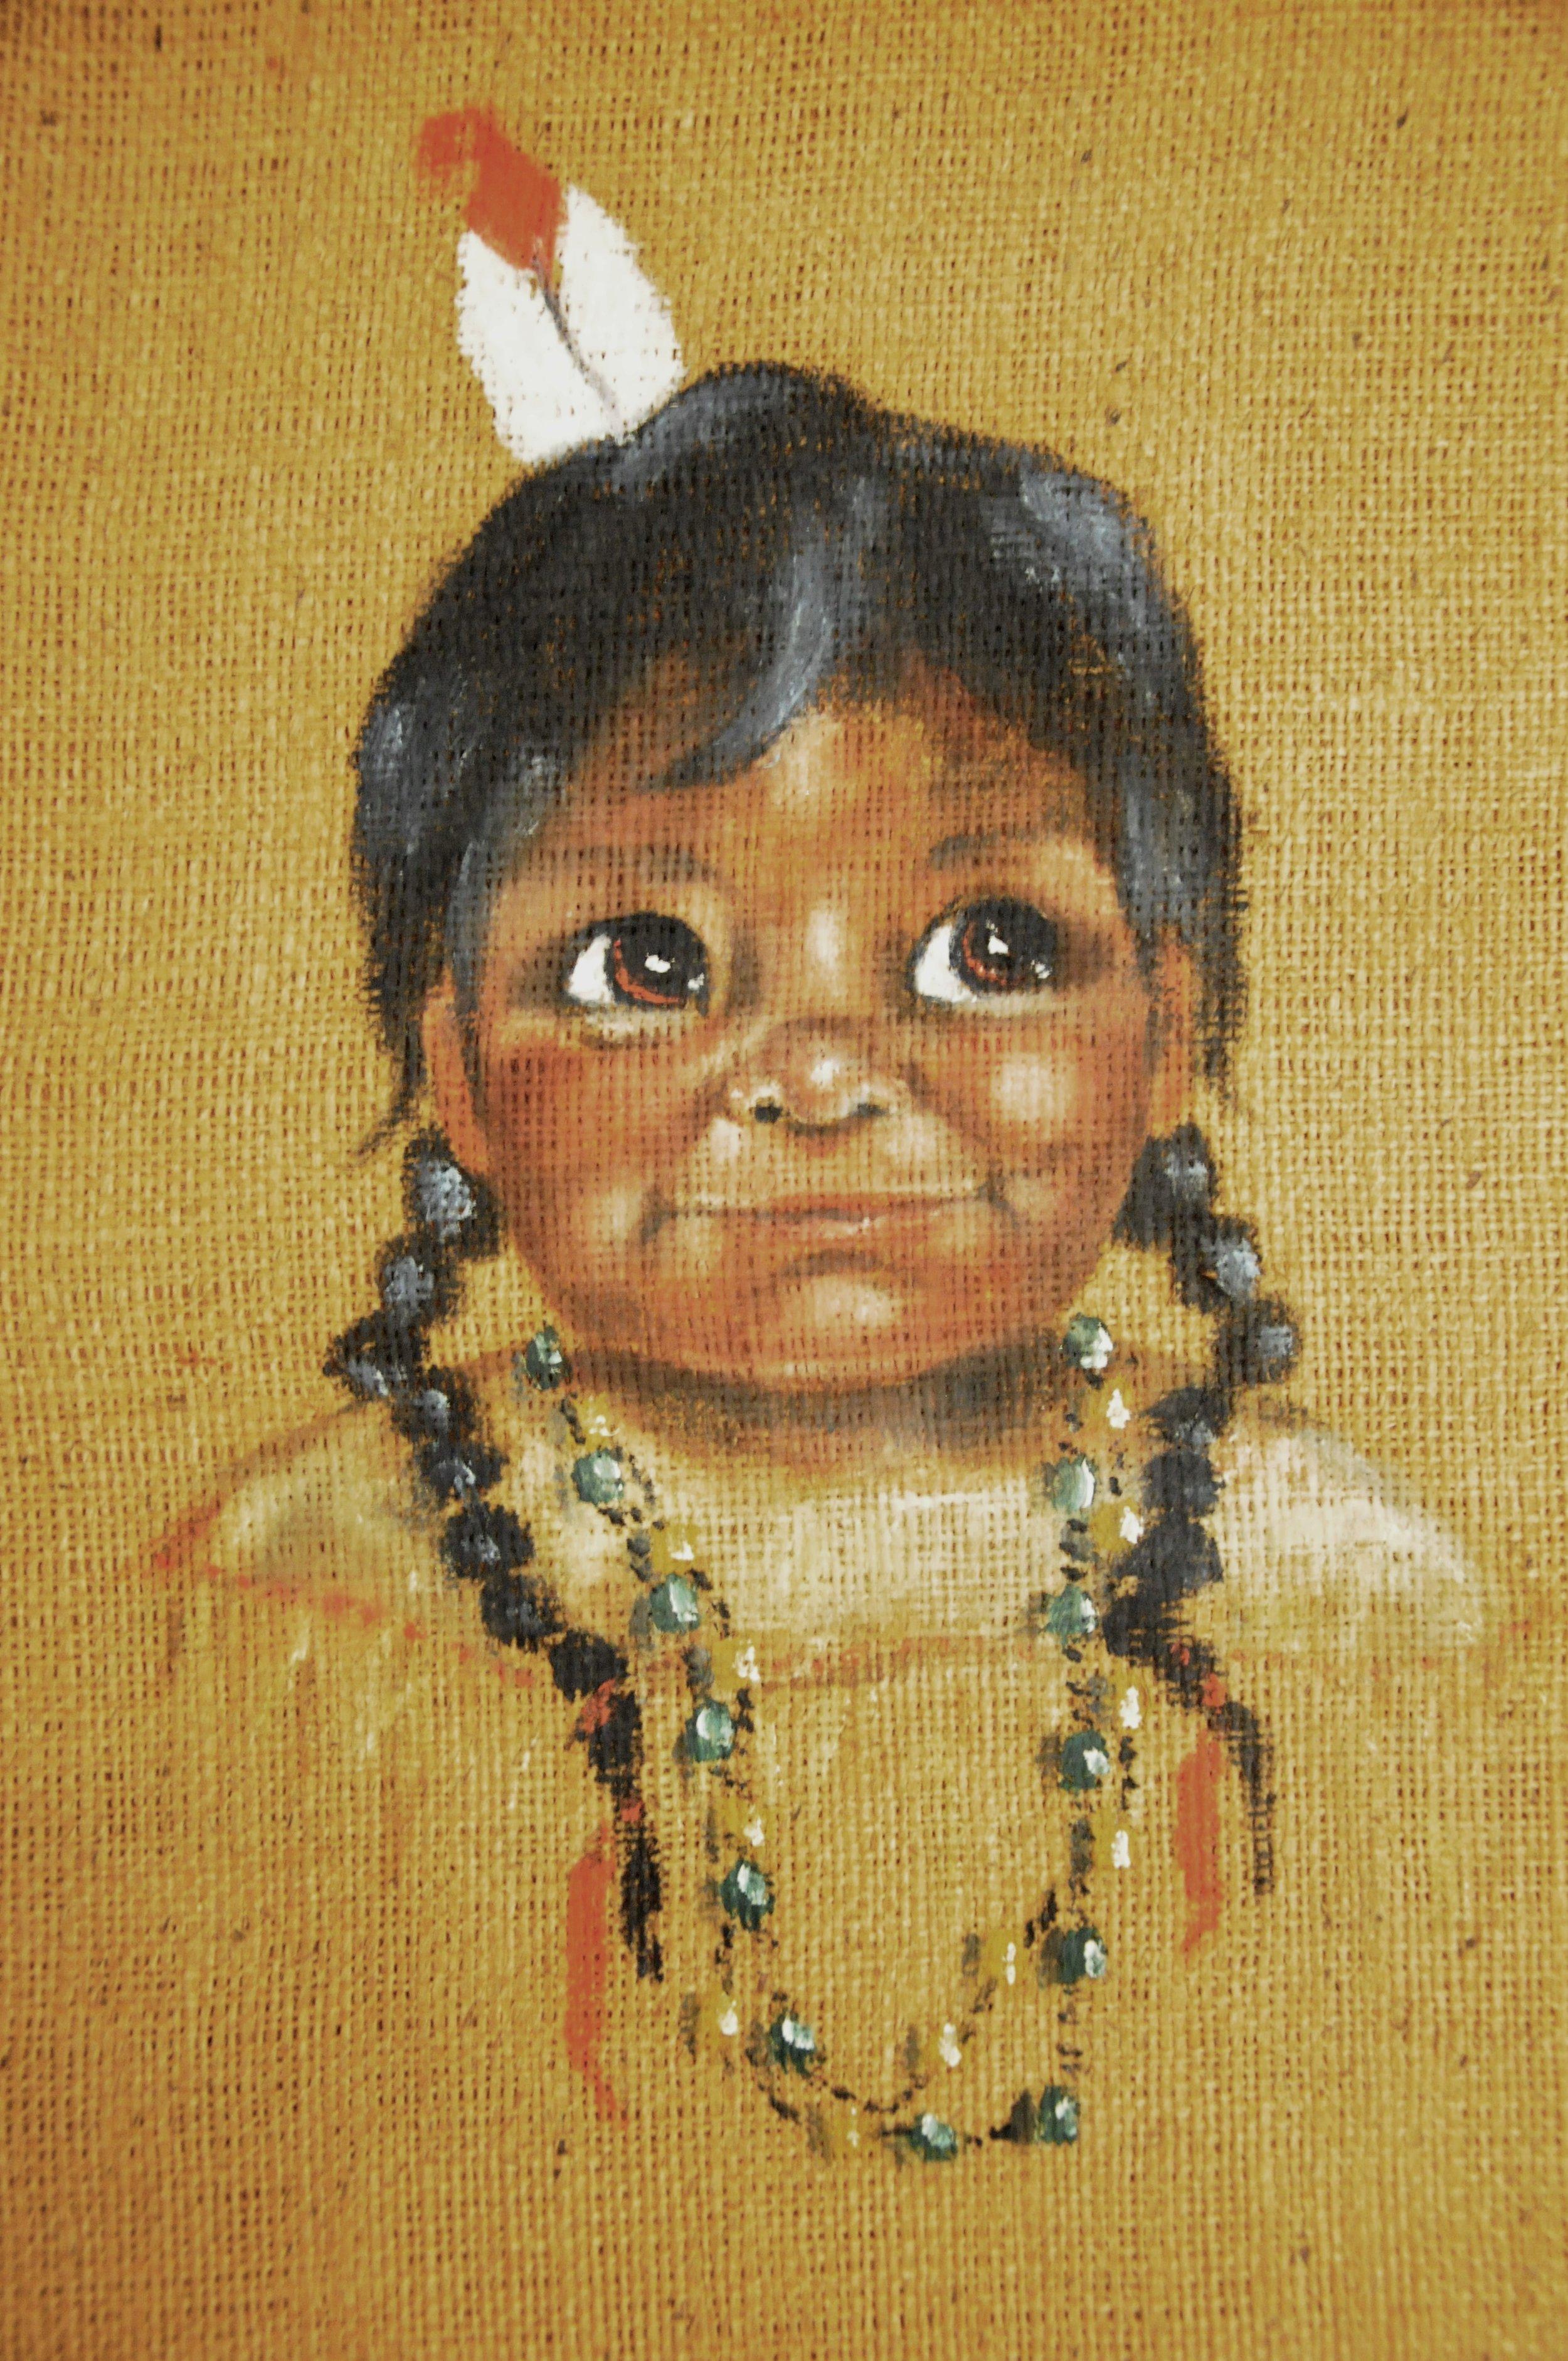 Untitled (Happy Child), c. 1960s, Fran Jenkins, acrylic on burlap